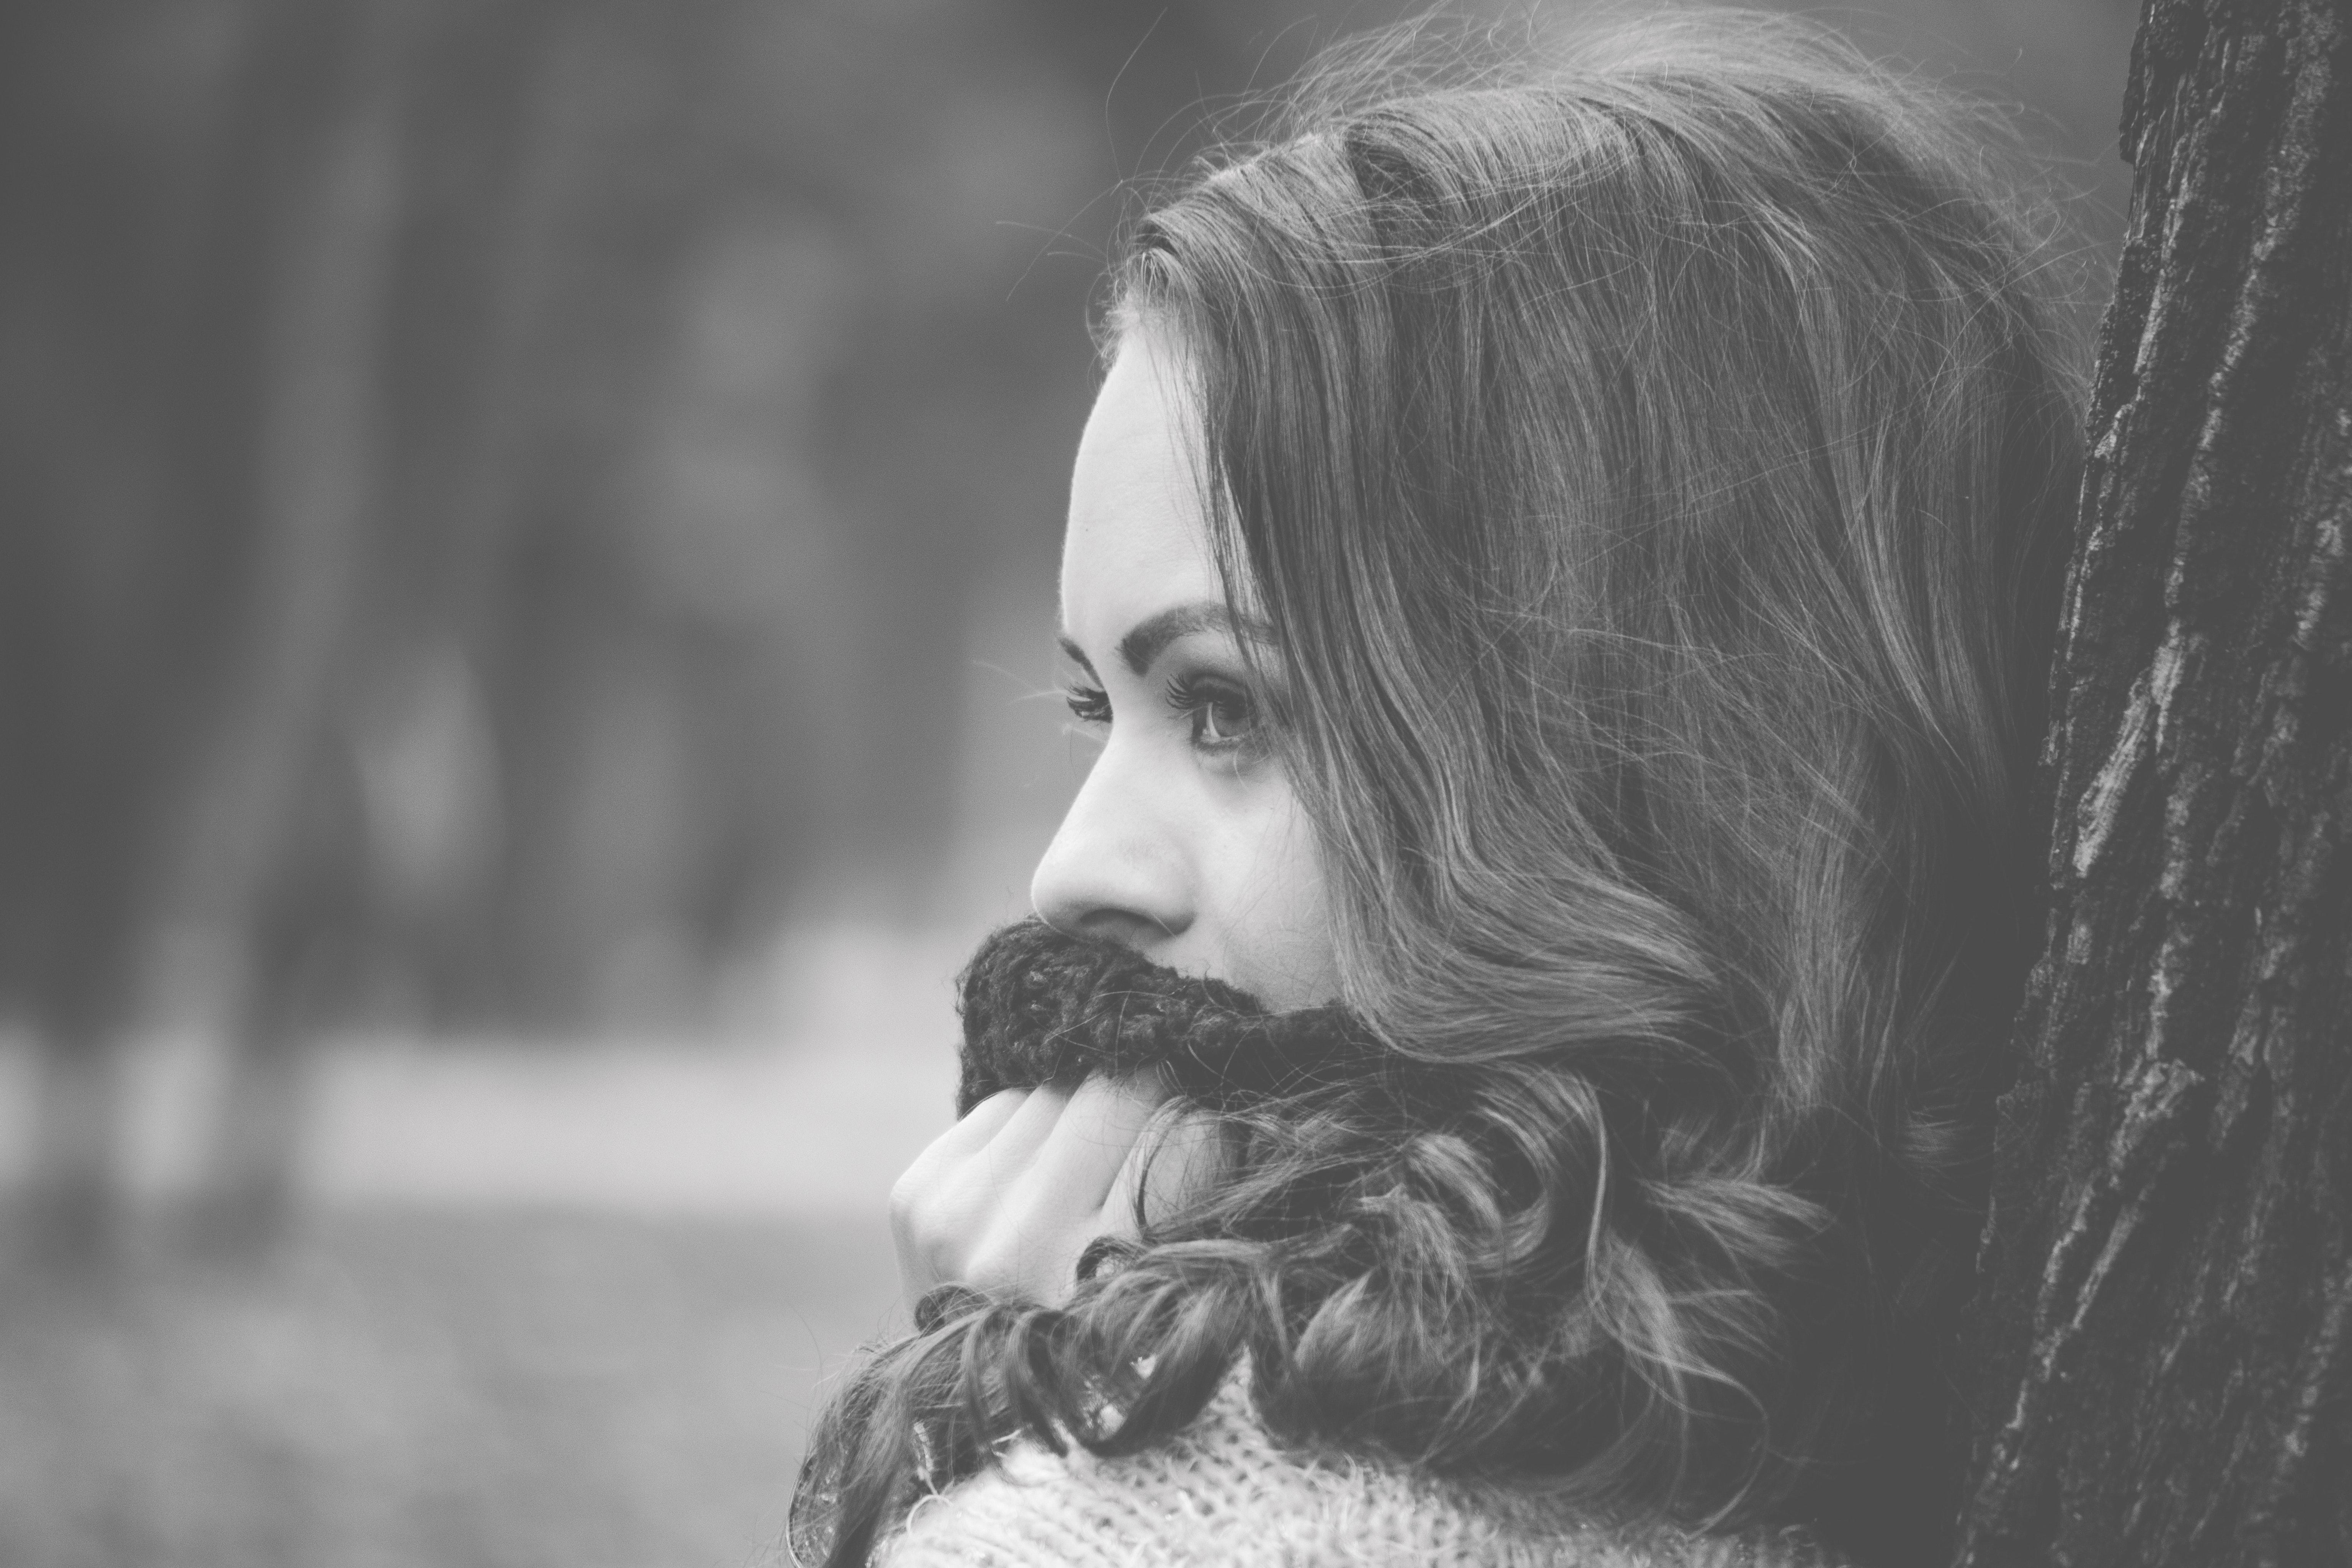 Girls in black and white pictures of Yuri Treskov 27